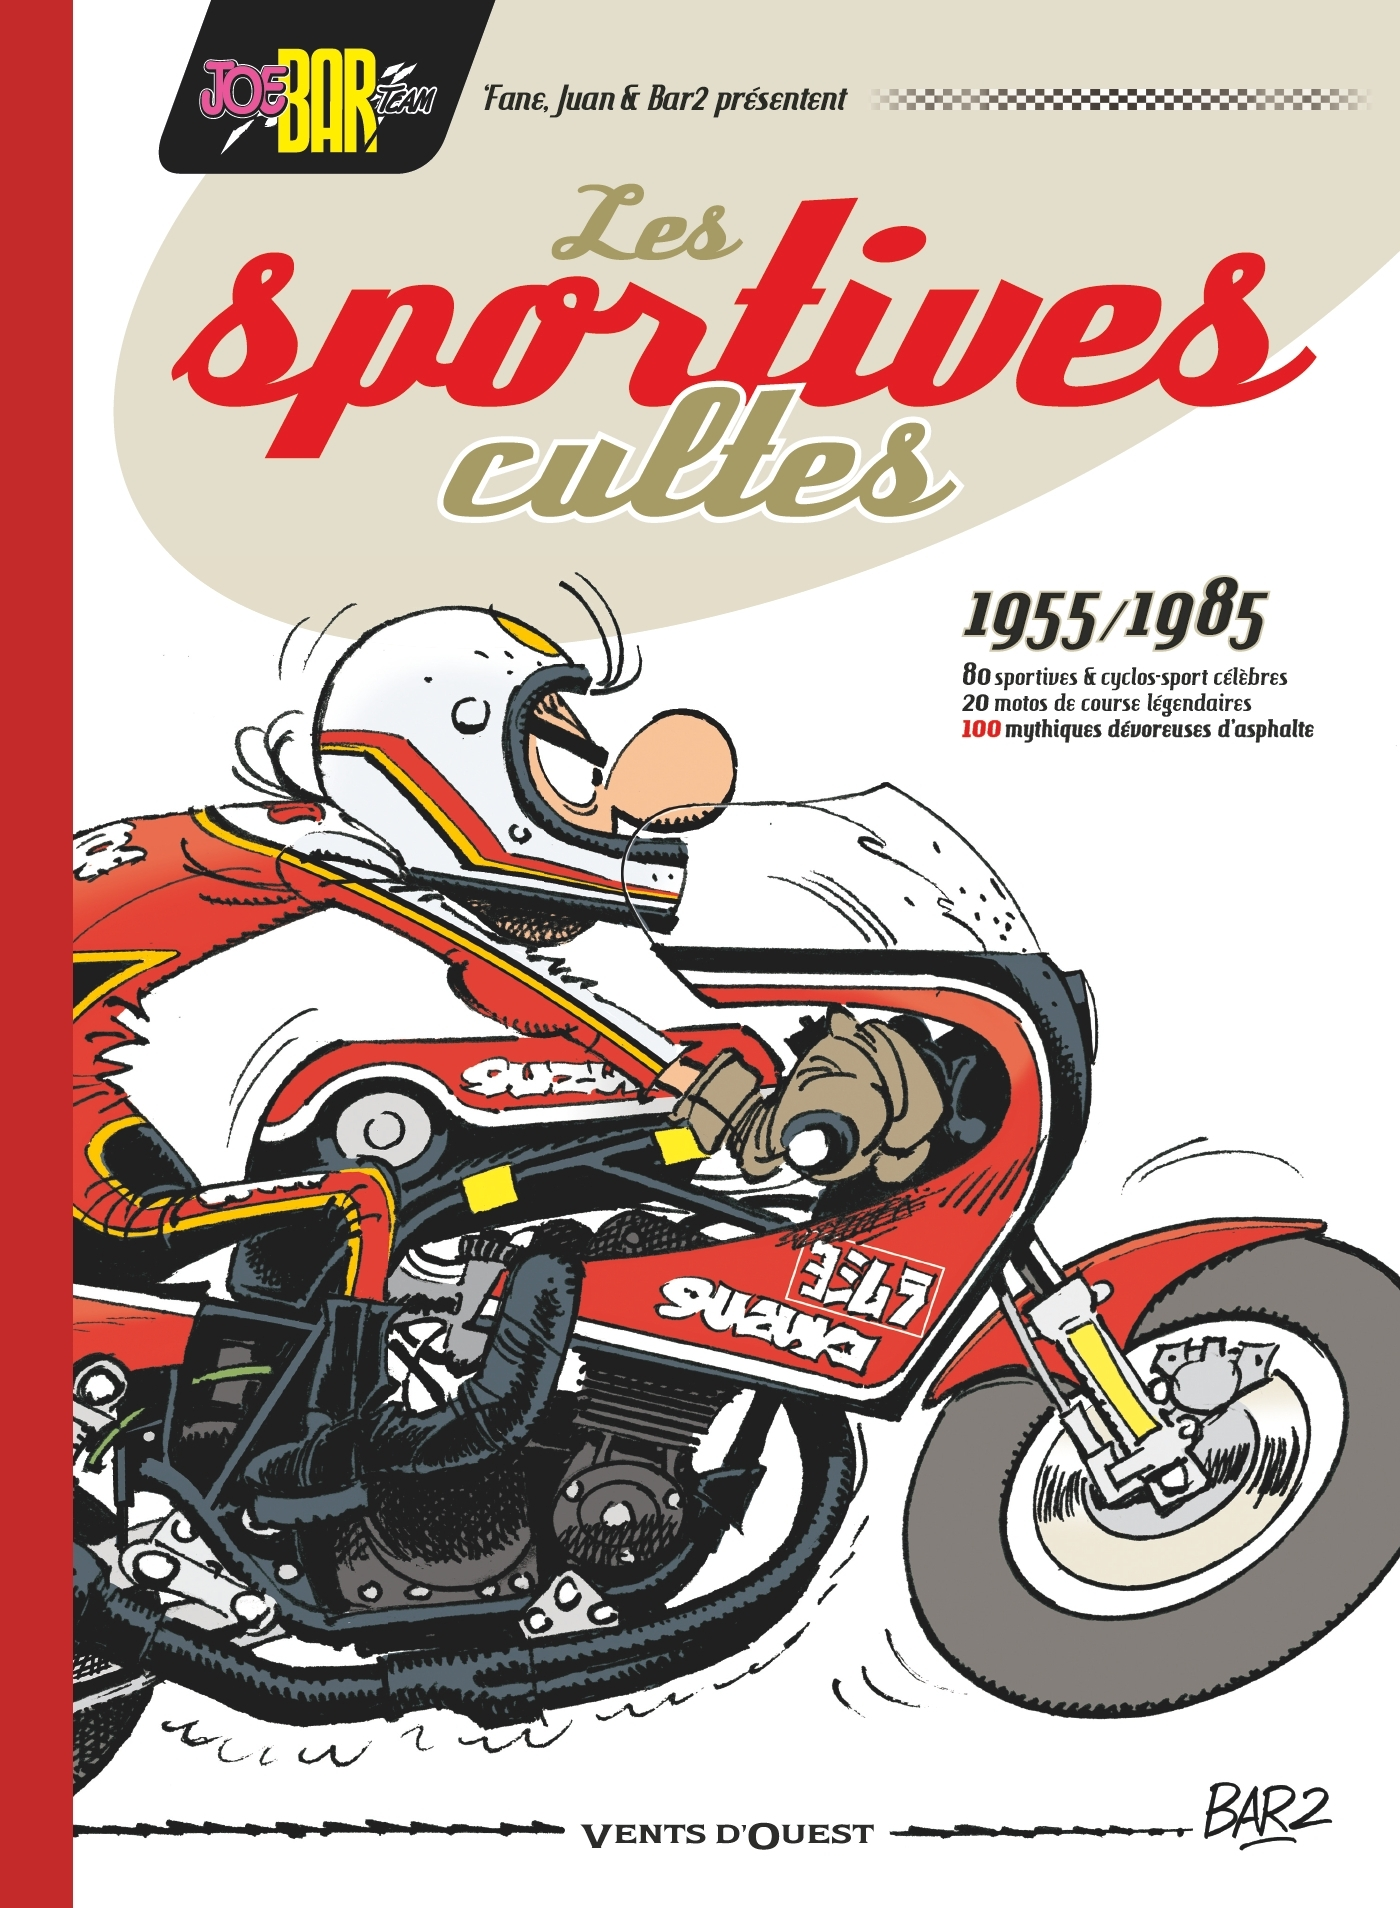 JOE BAR TEAM PRESENTE LES SPORTIVES CULTES (1955/1985) - NE - 100 MYTHIQUES DEVOREUSES D'ASPHALTE